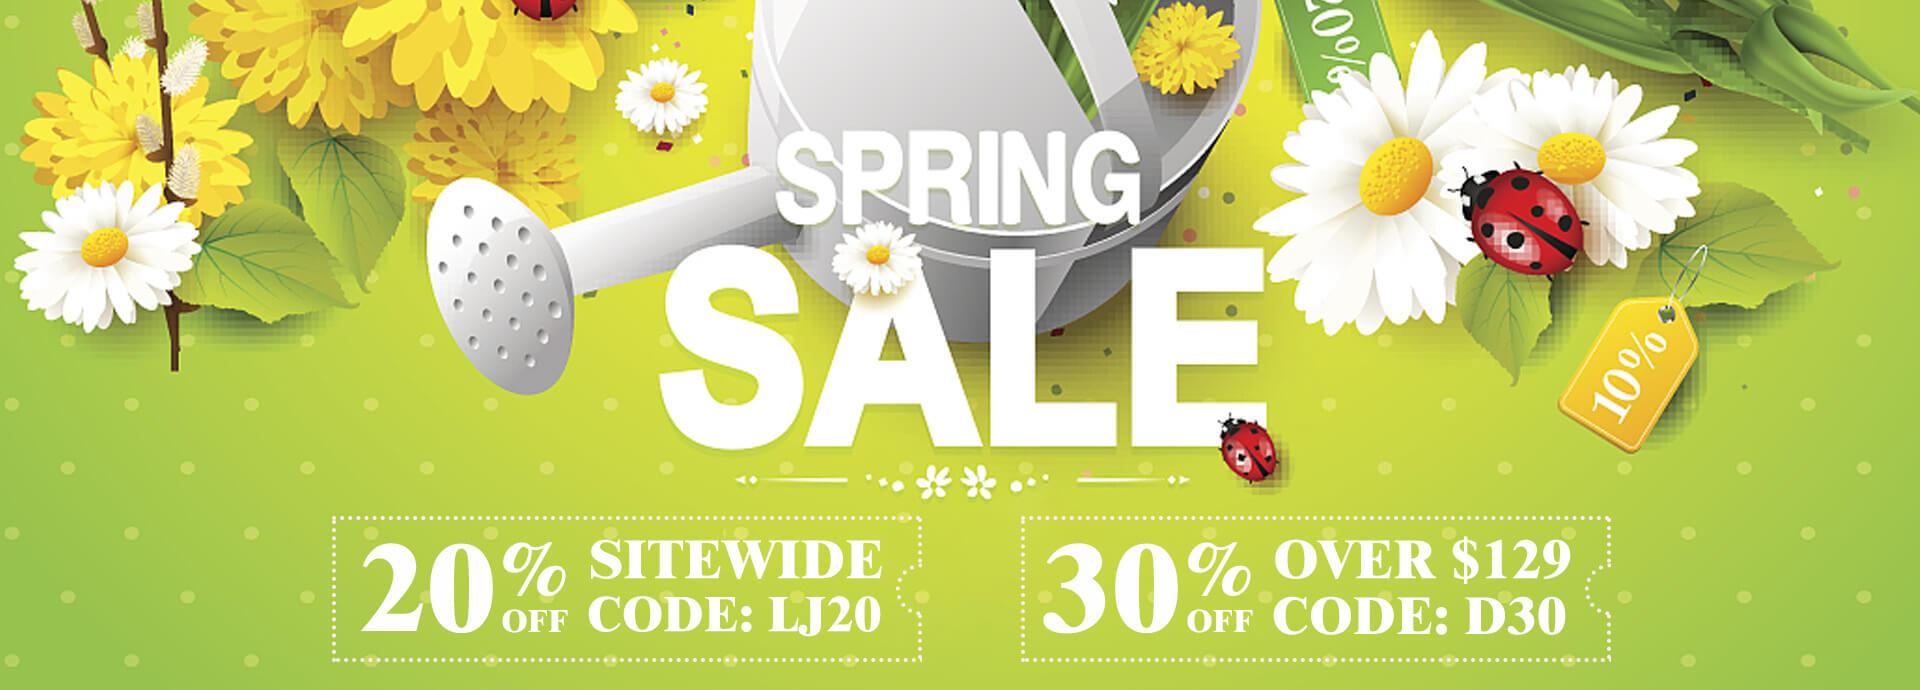 Lajerrio Spring Sale